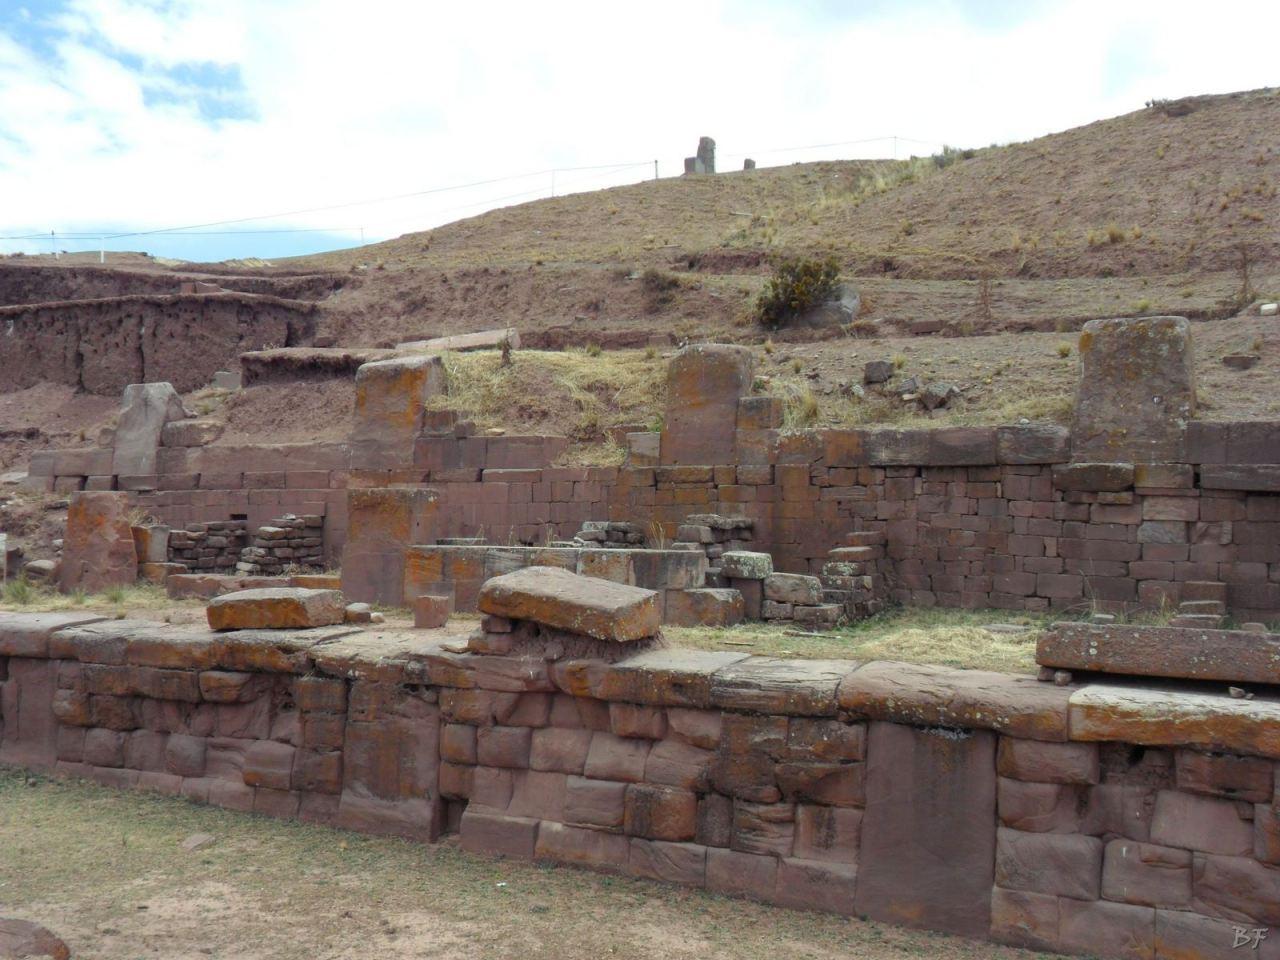 Sito-Megalitico-Piramide-Akapana-Kalasasaya-Menhir-Tiahuanaco-Bolivia-107